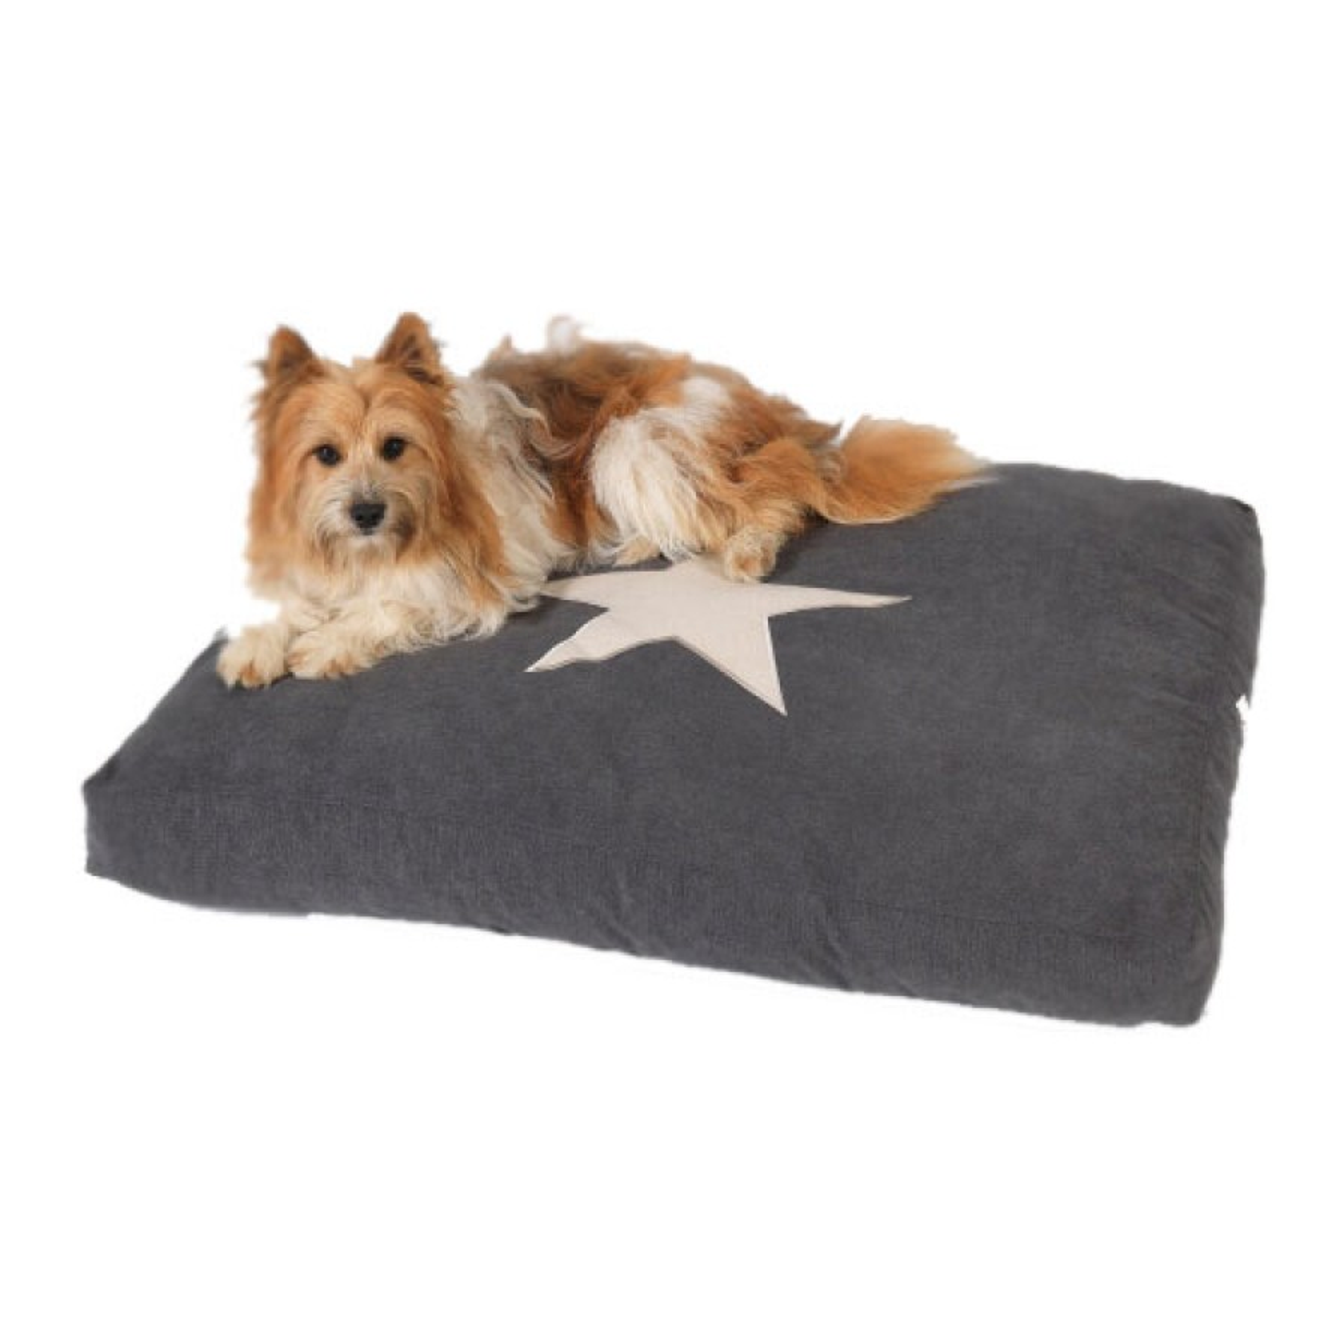 hundekissen be a star anthrazit in 3 gr ssen luxus. Black Bedroom Furniture Sets. Home Design Ideas